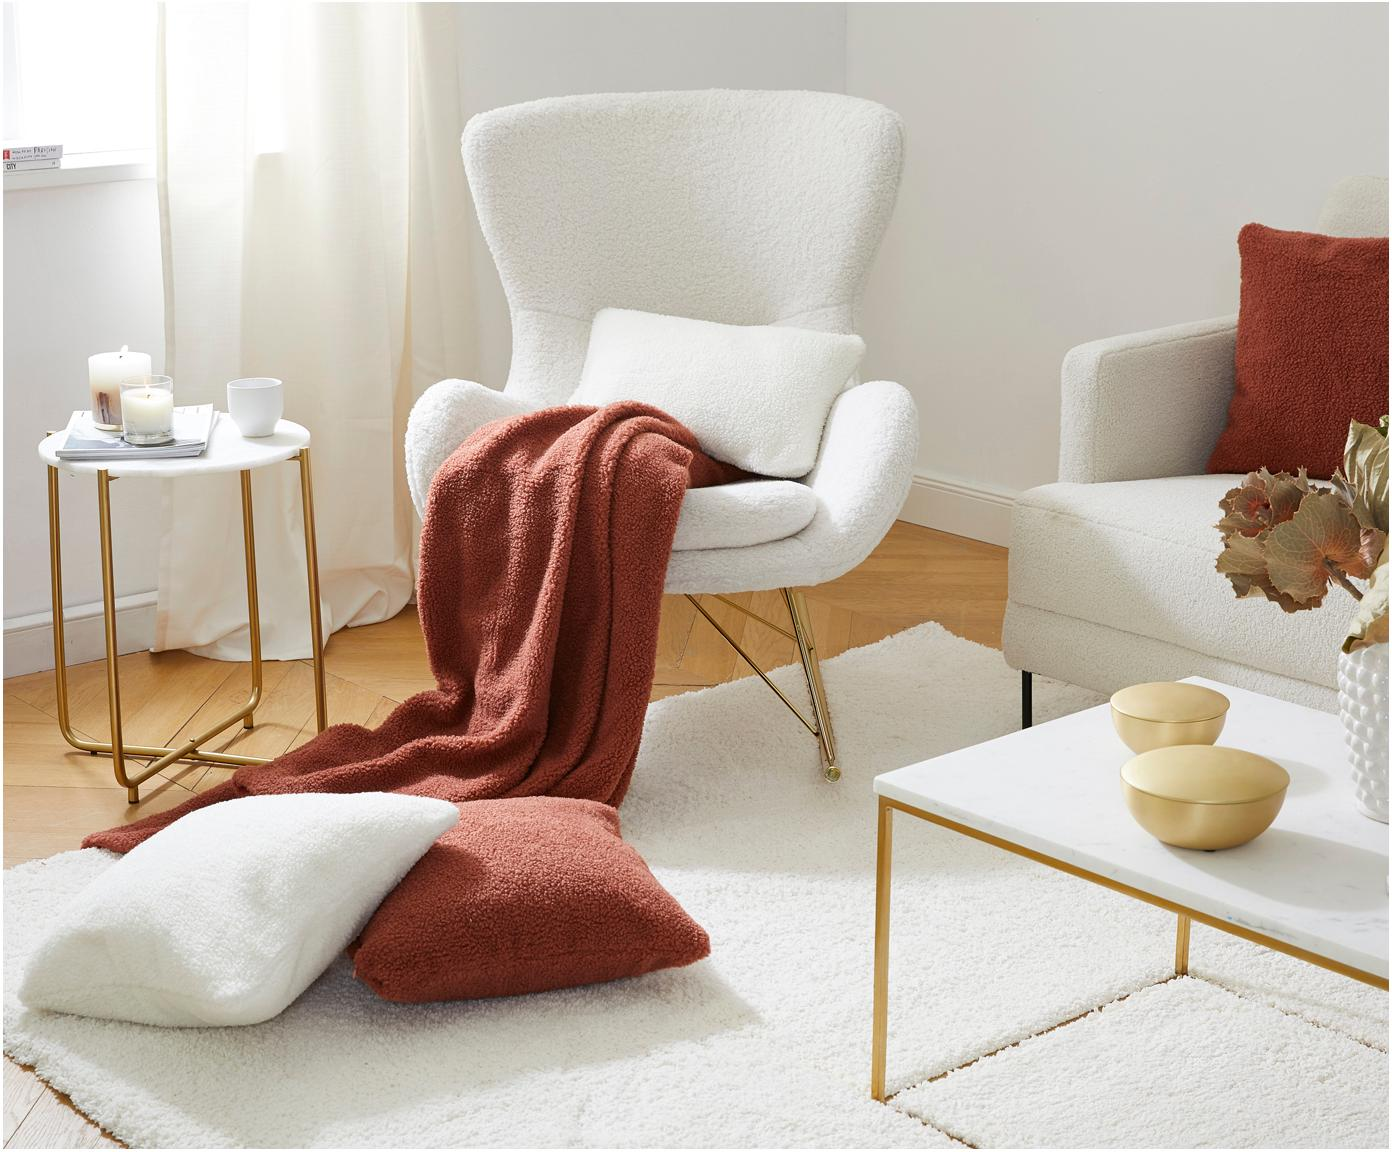 Teddy schommelstoel Wing, Bekleding: polyester (teddy), Frame: gegalvaniseerd metaal, Crèmewit, B 77 x D 96 cm